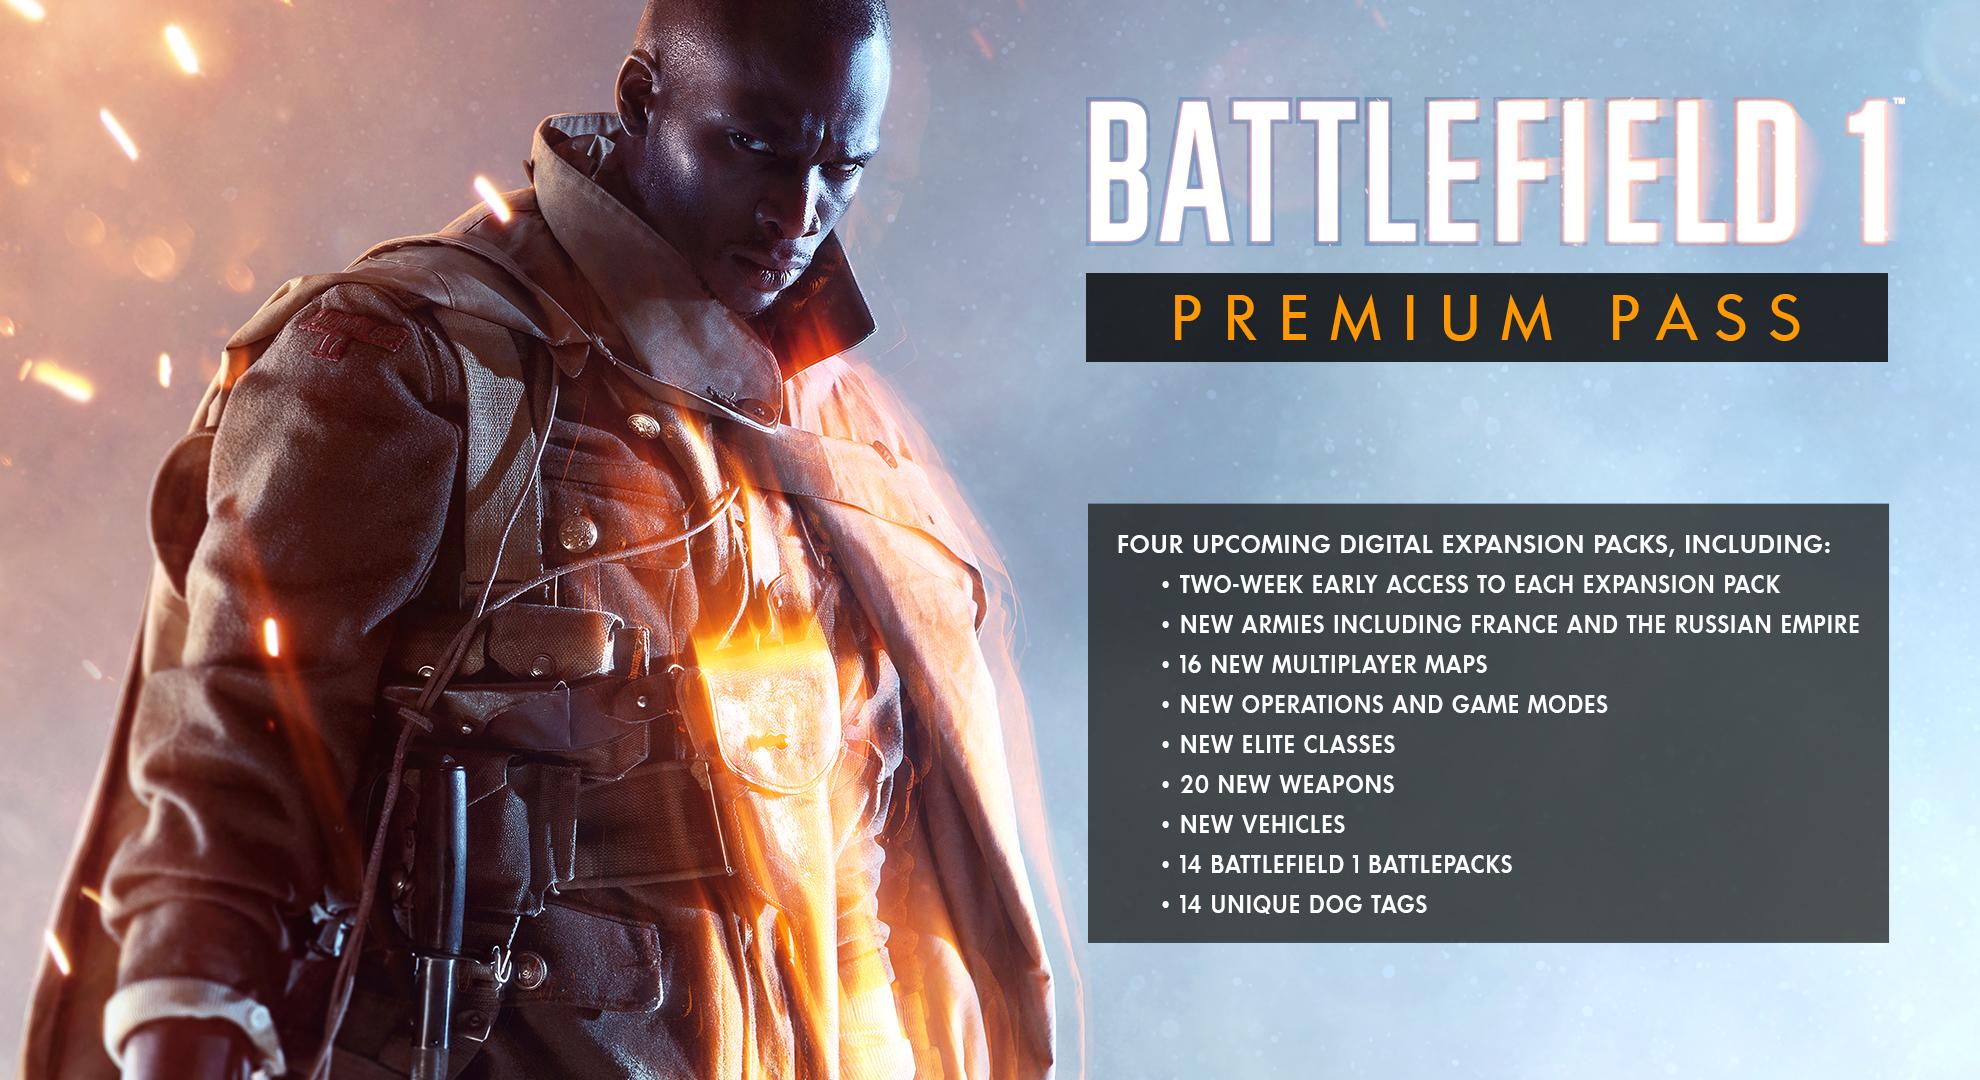 battlefield-1-premium-pass-online-game-code